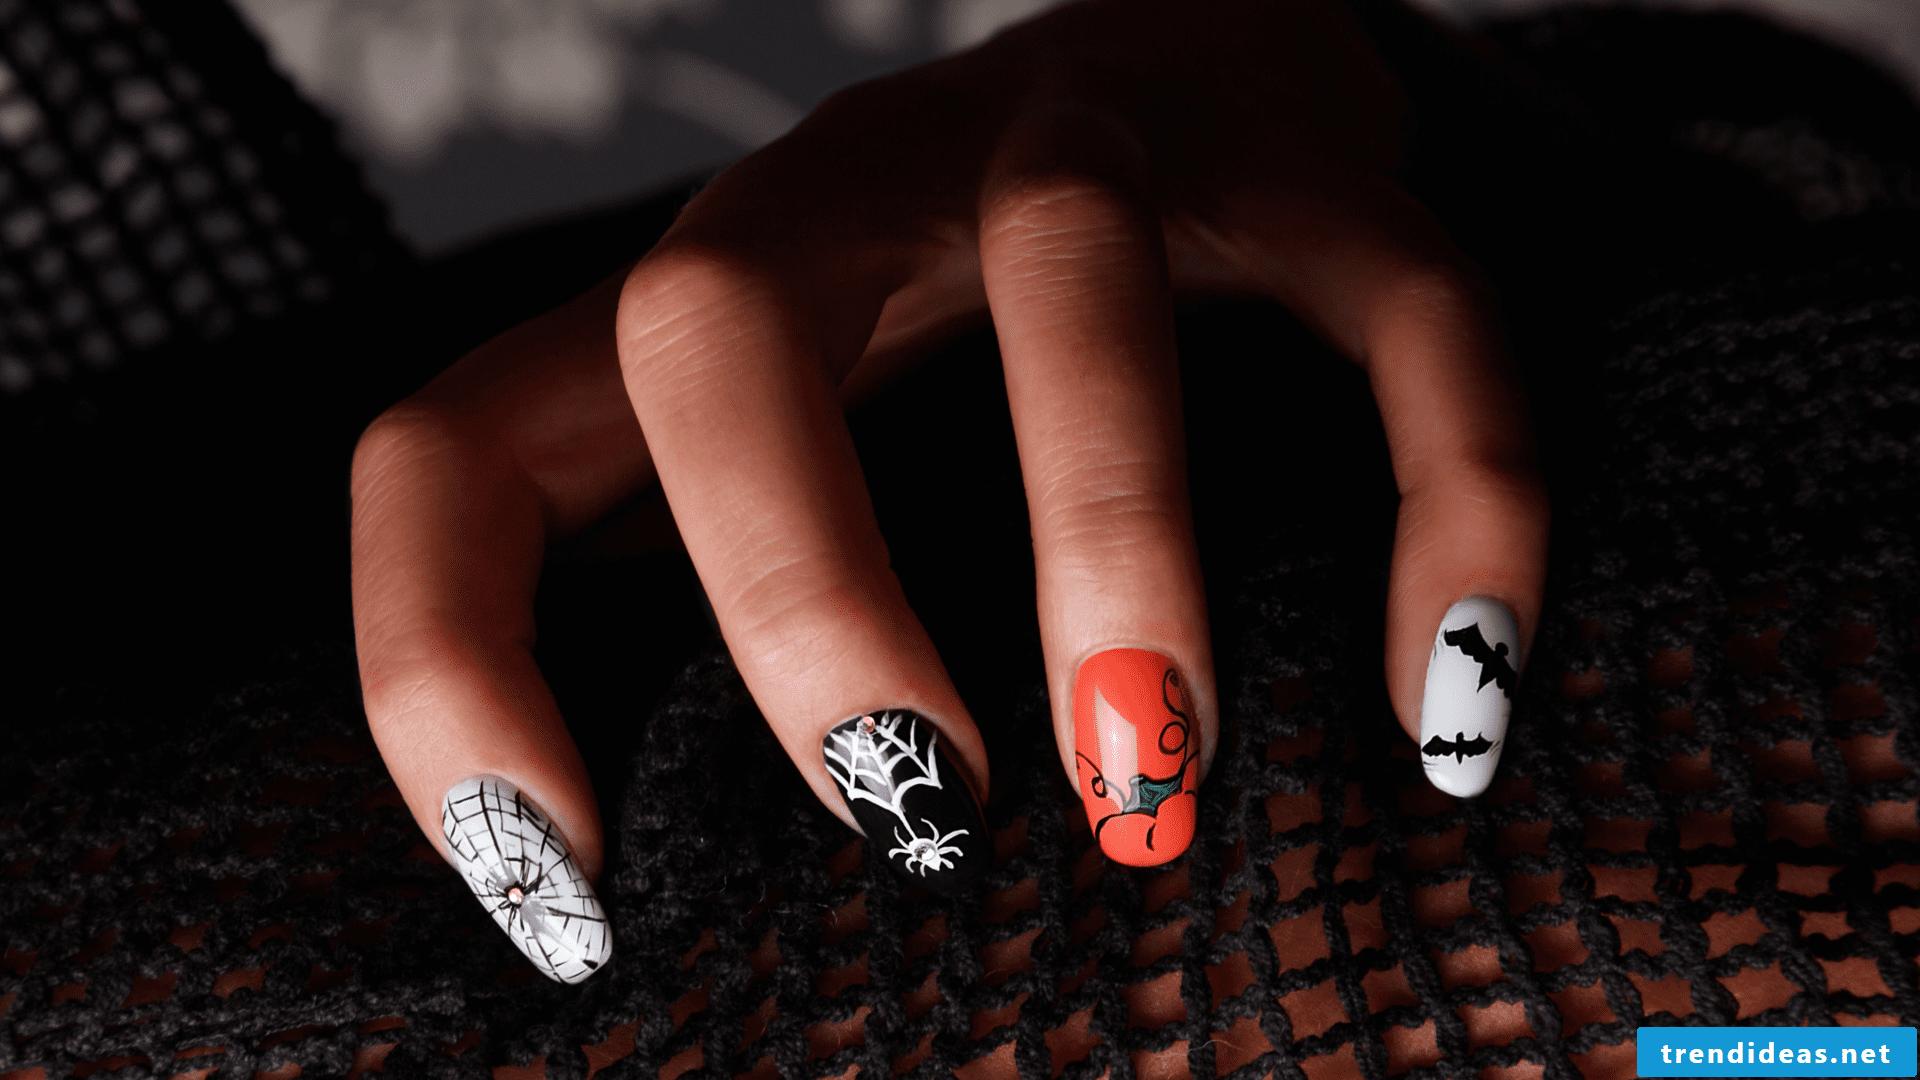 Halloween nails DIY ideas